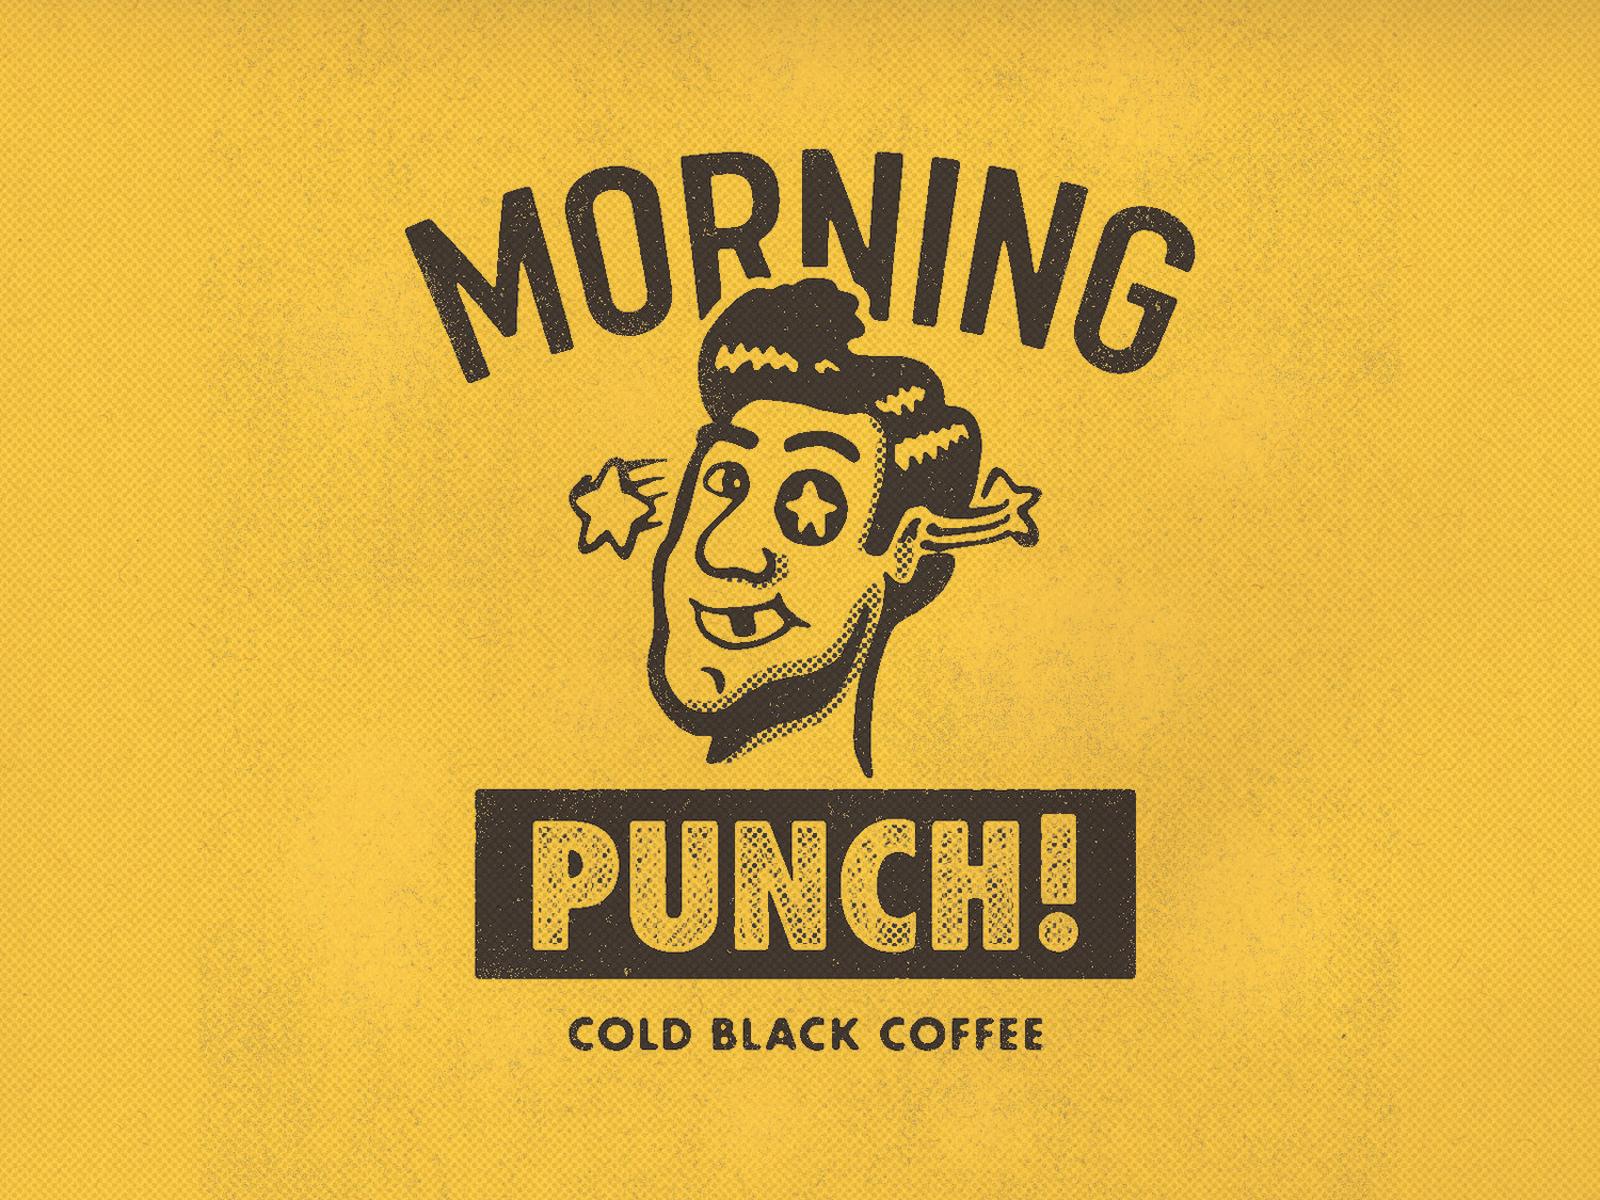 stuffed-brain-studio-morning-punch-brand-identity-01.png